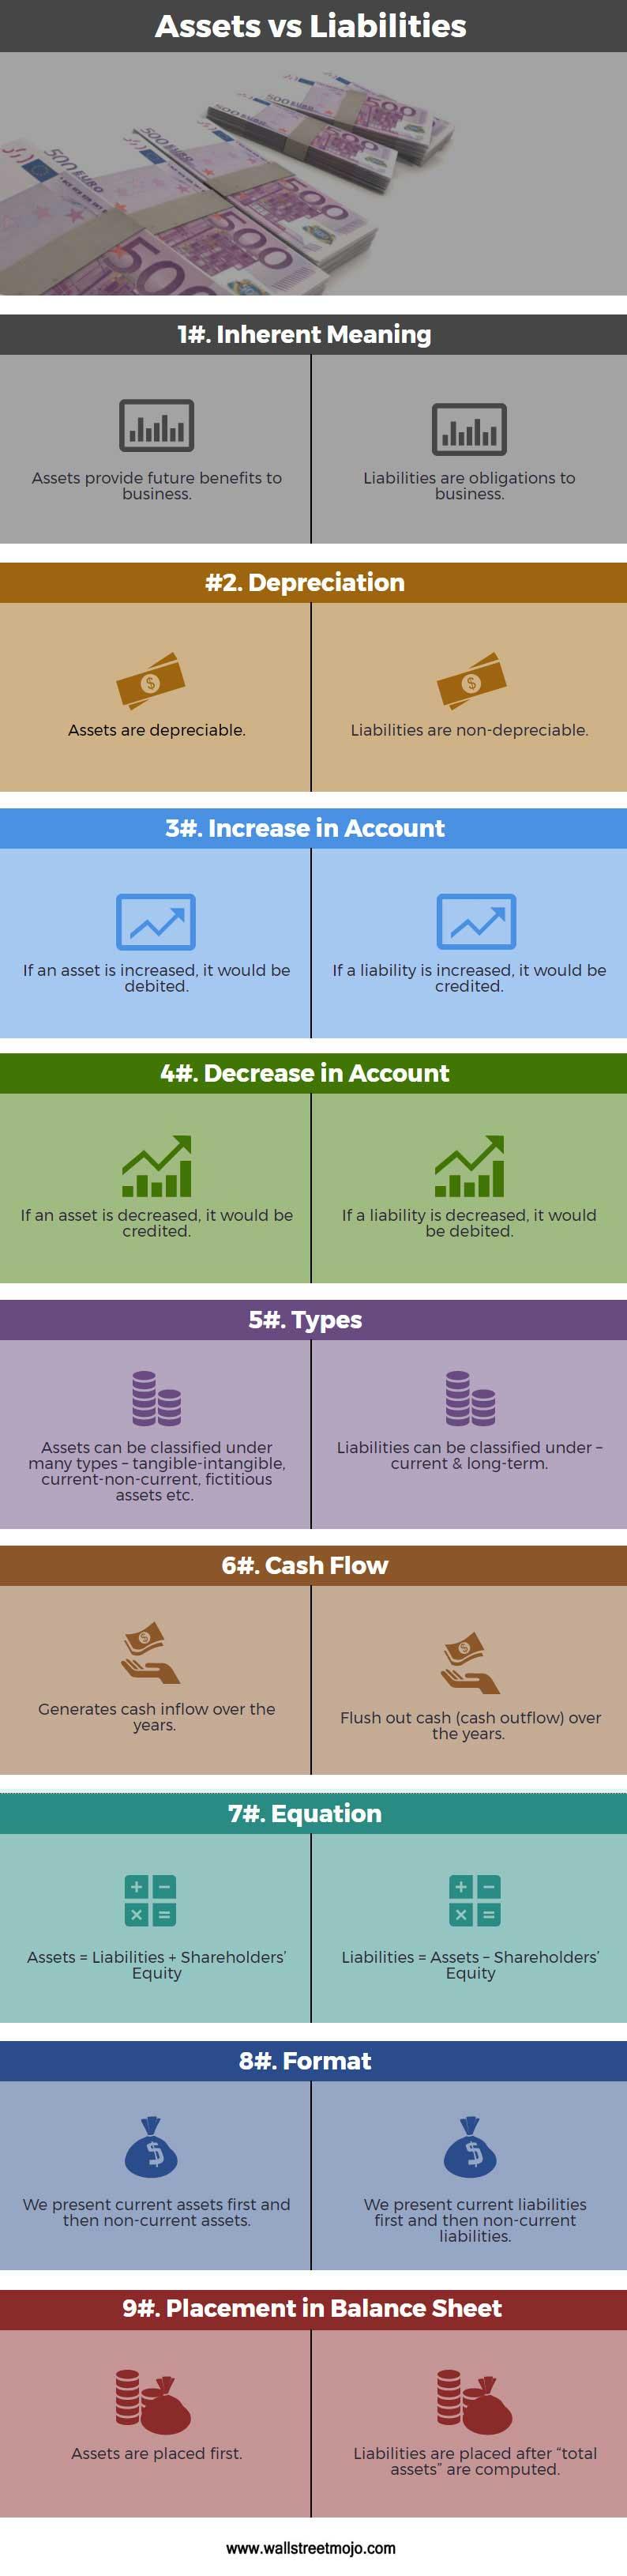 Assets-vs-Liabilities-new